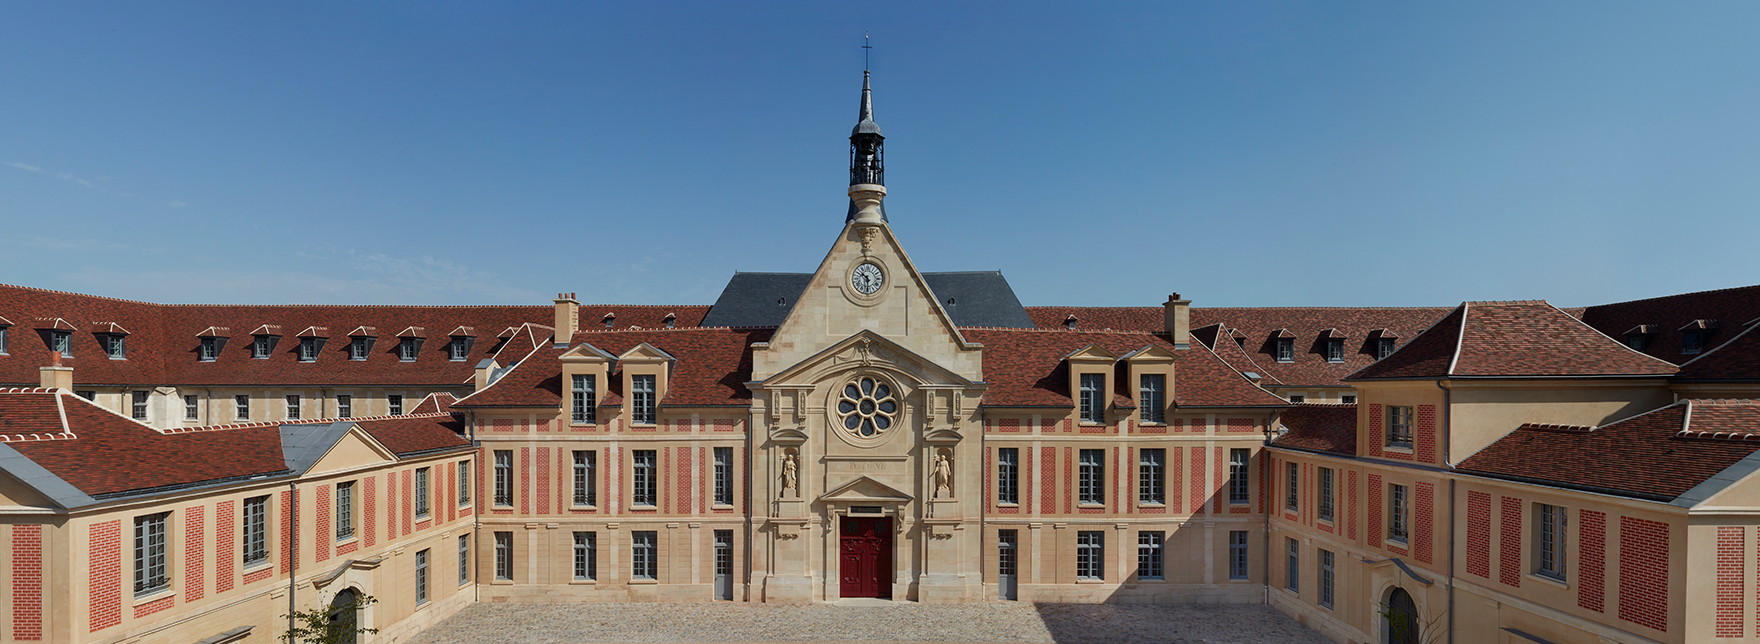 Ancien Hôpital Laennec